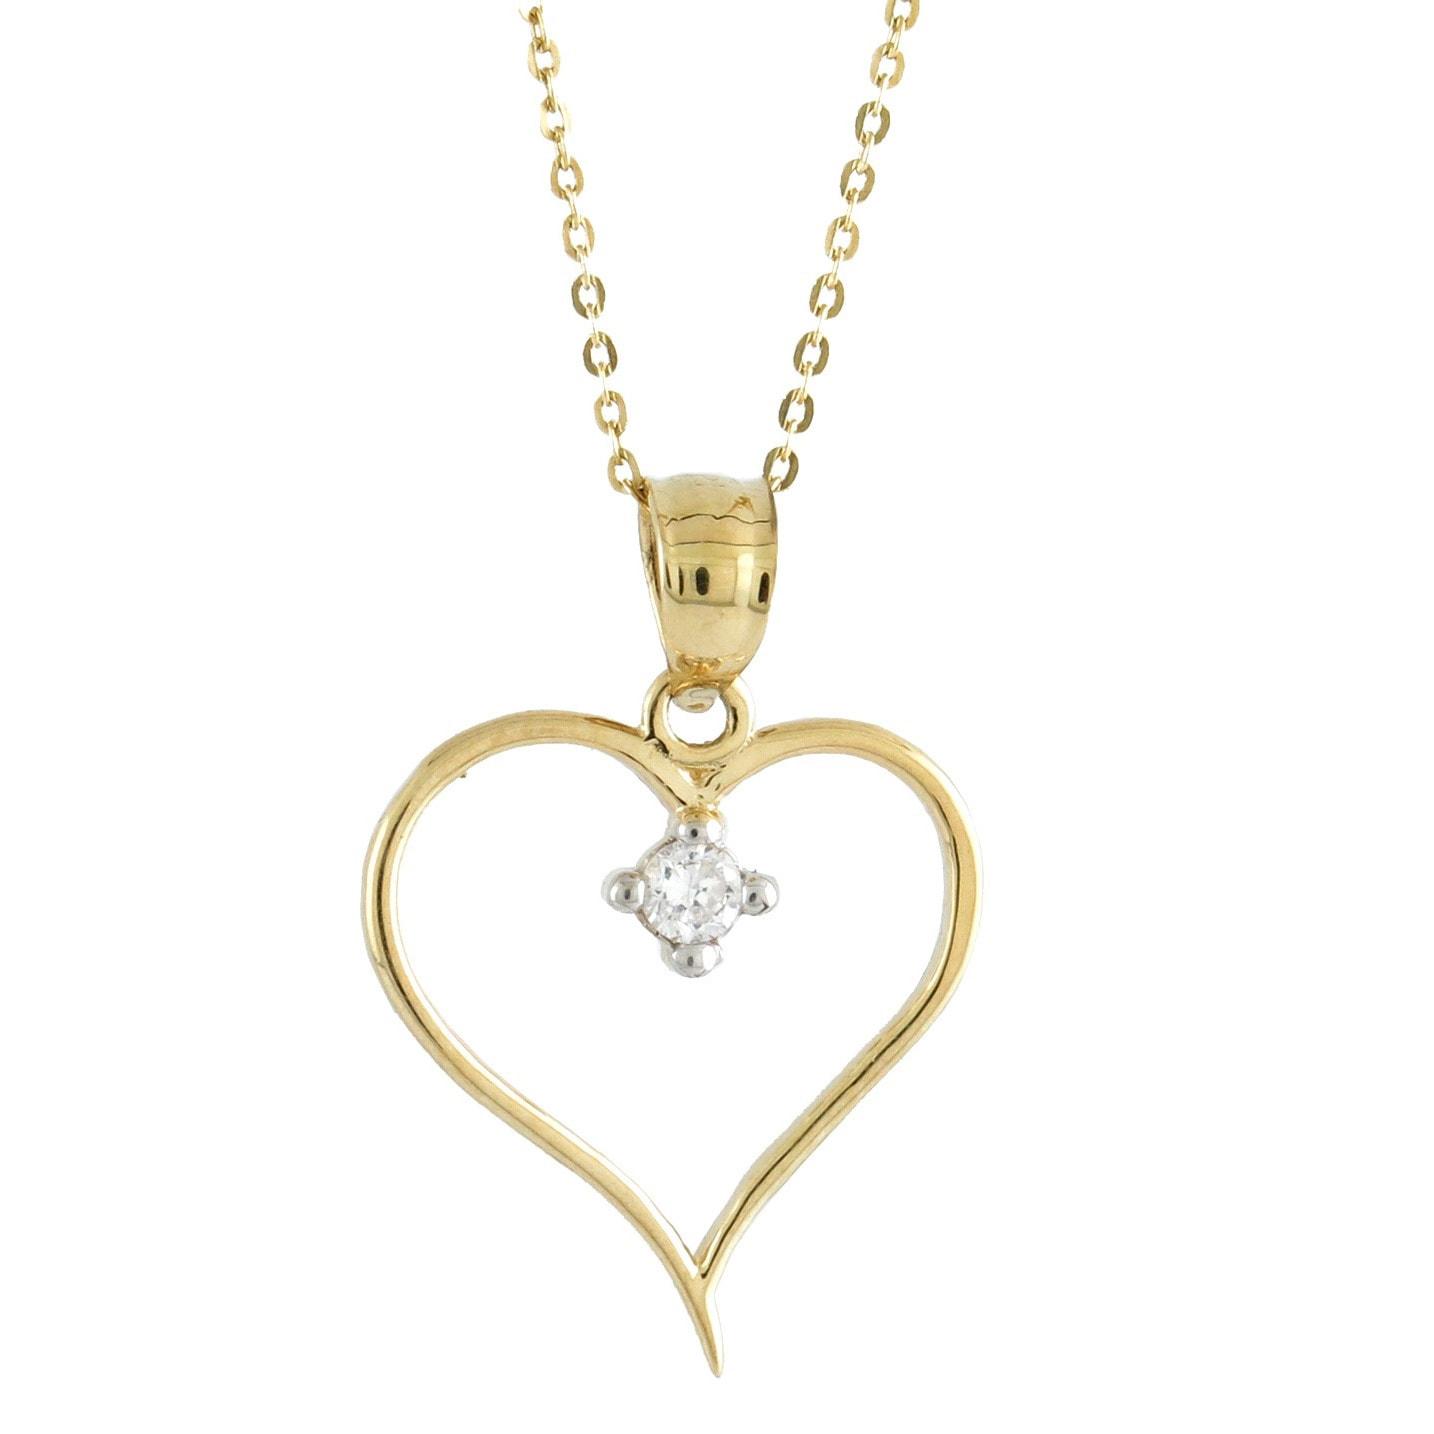 14k Yellow Gold Open Heart CZ Pendant Charm